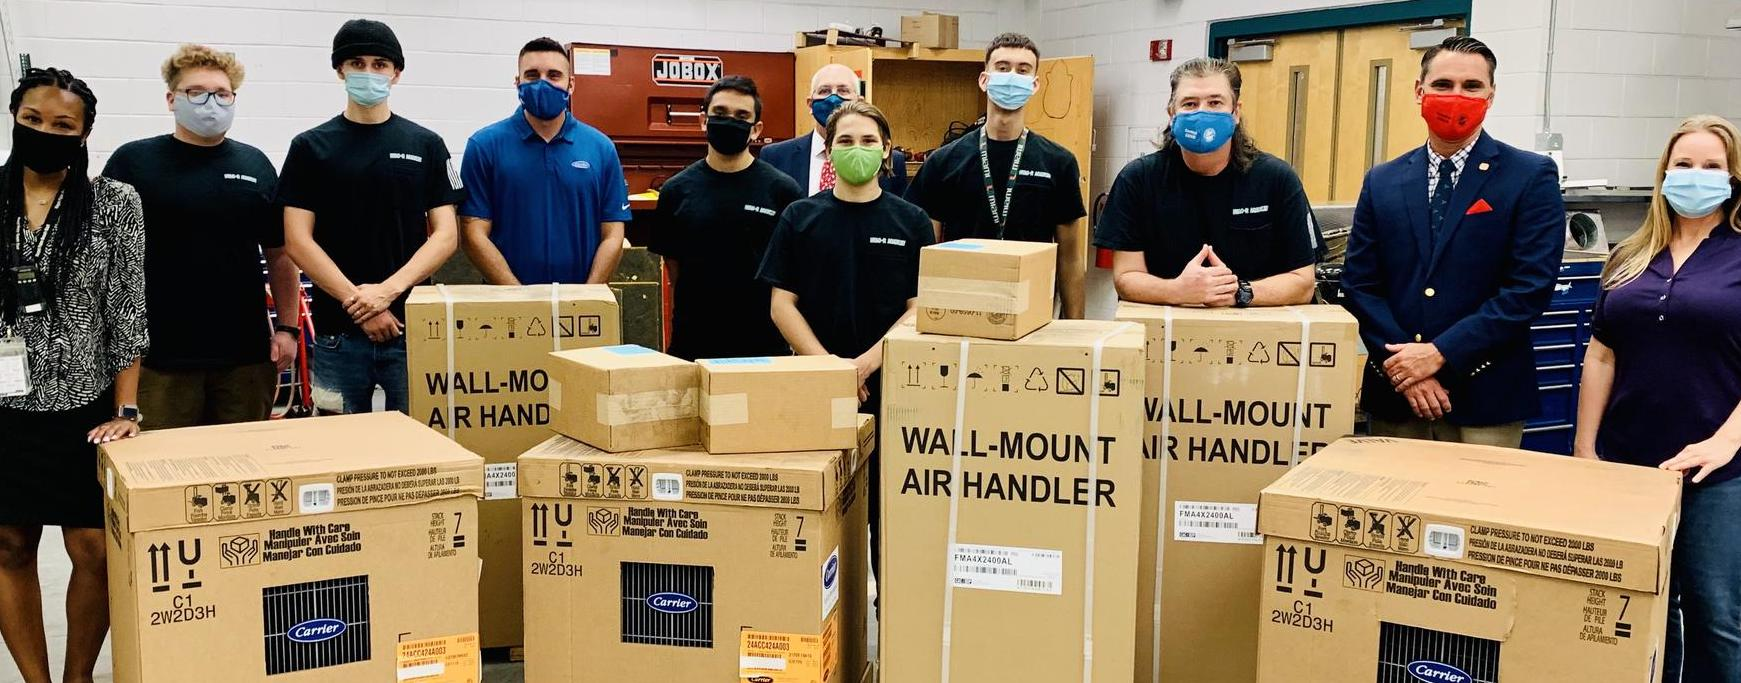 Students, Administrators & EFPBC Staff with HVAC equipment donation